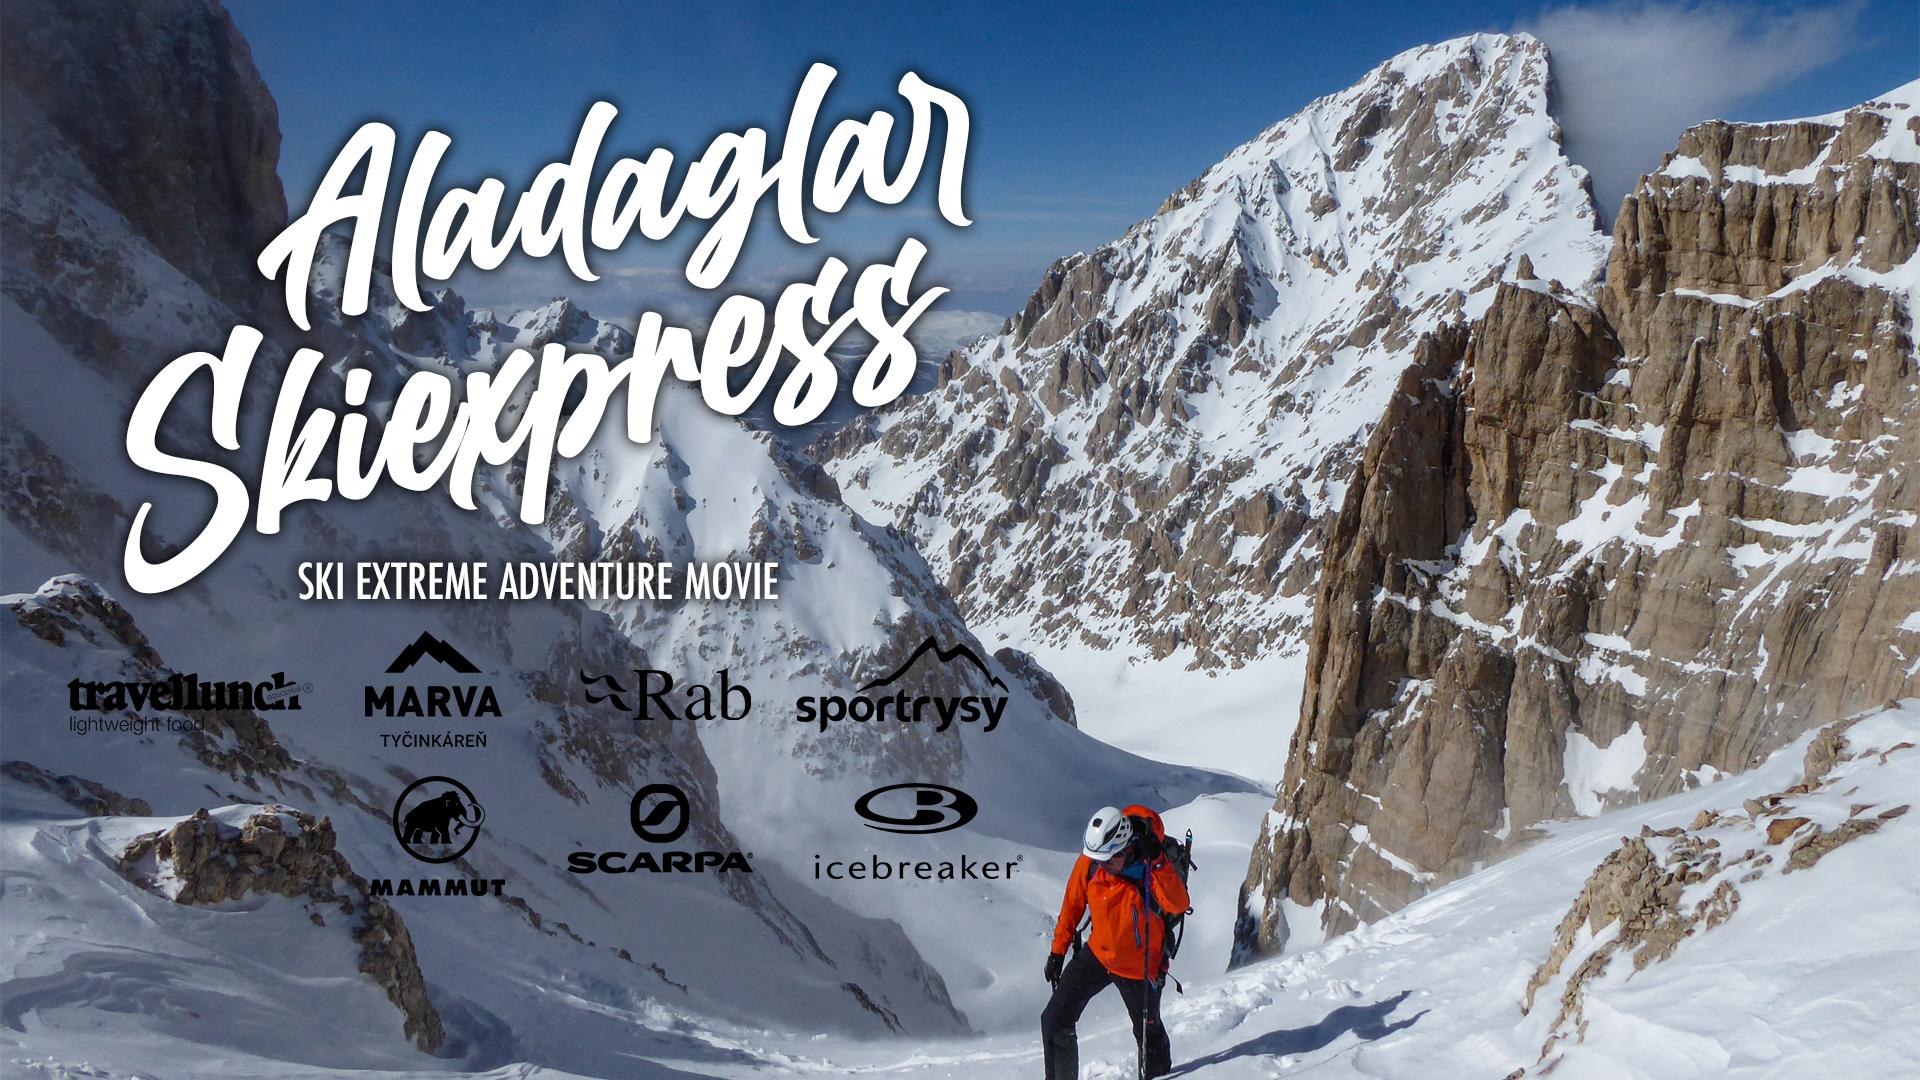 aladaglar skiexpress title image 16-9